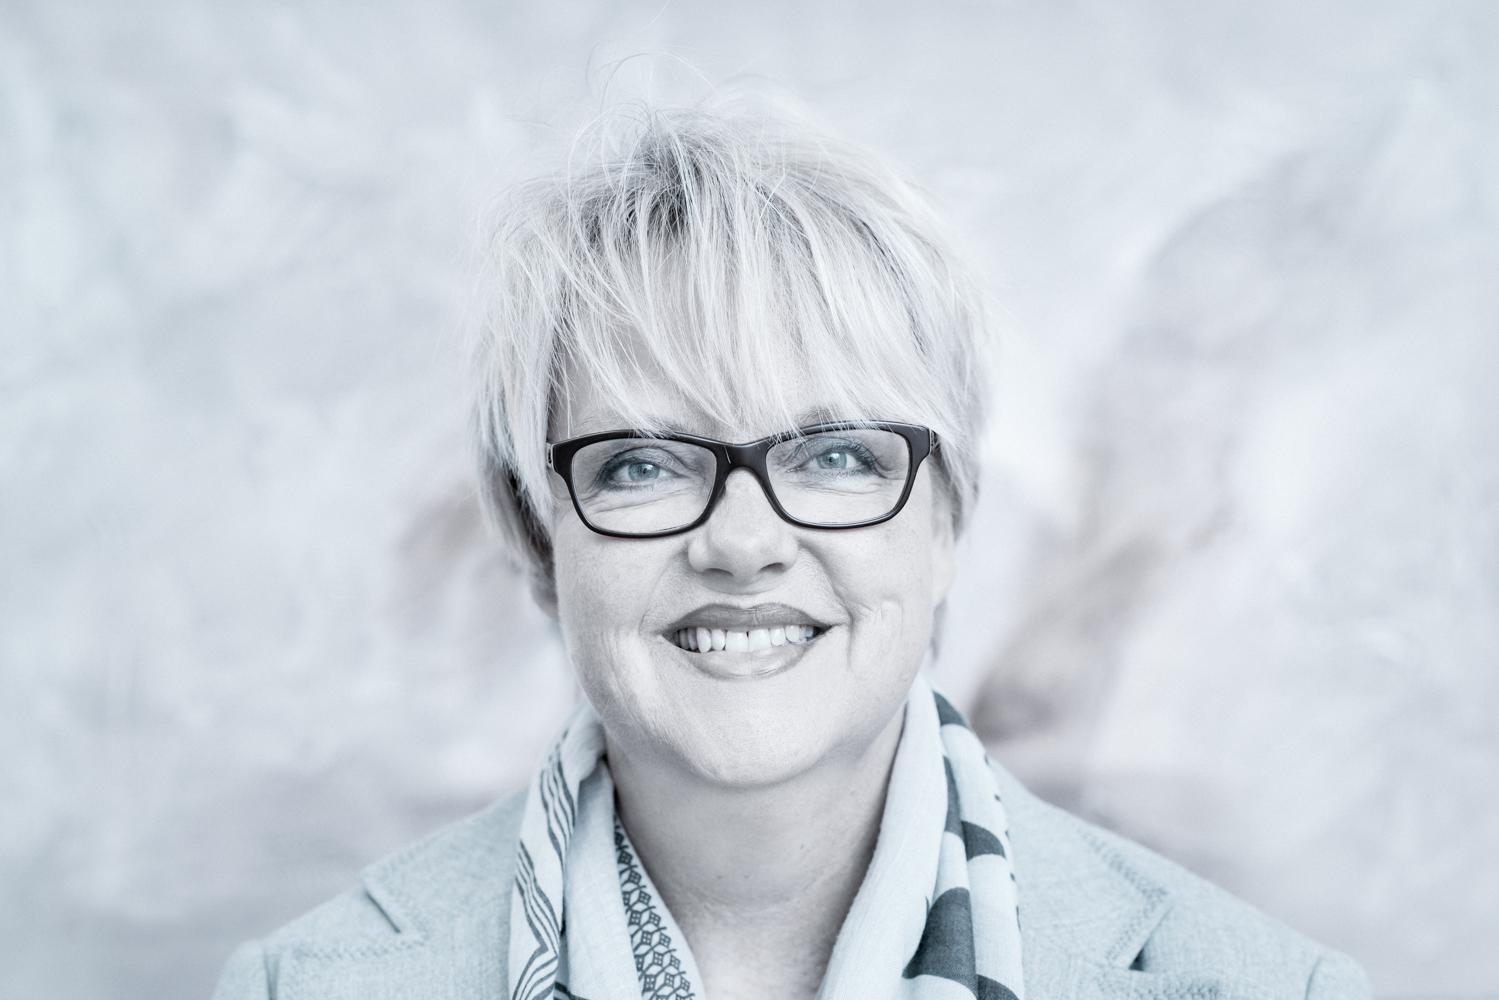 Адвокат Рут Штанге-Вингер